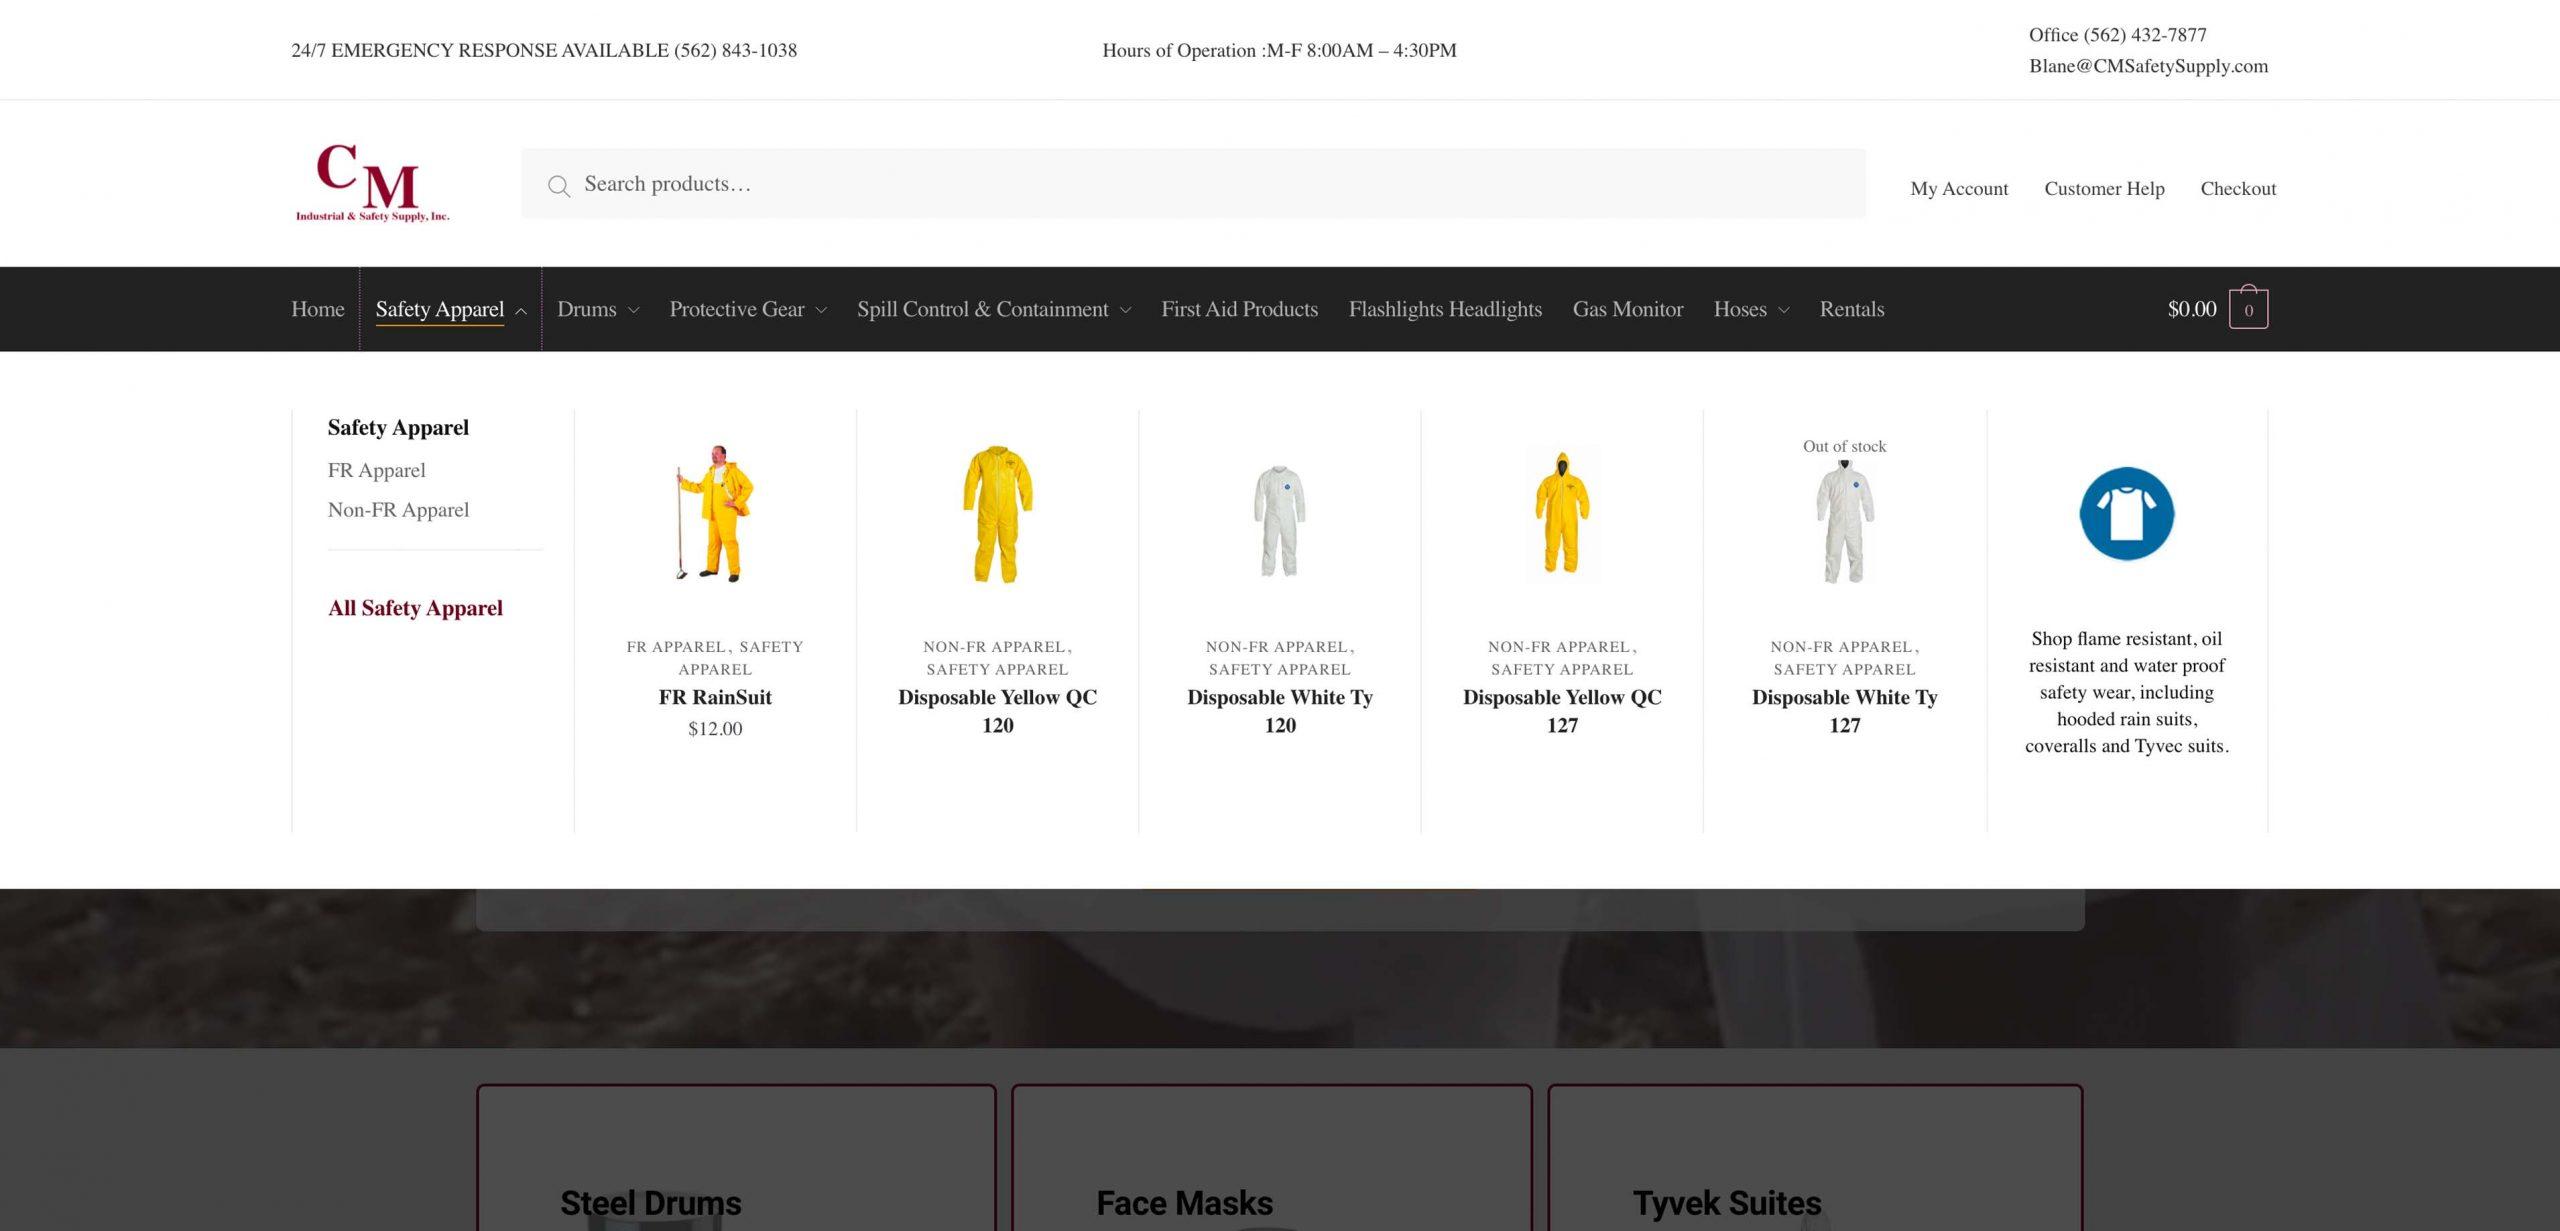 mega menu development for cm safety supply